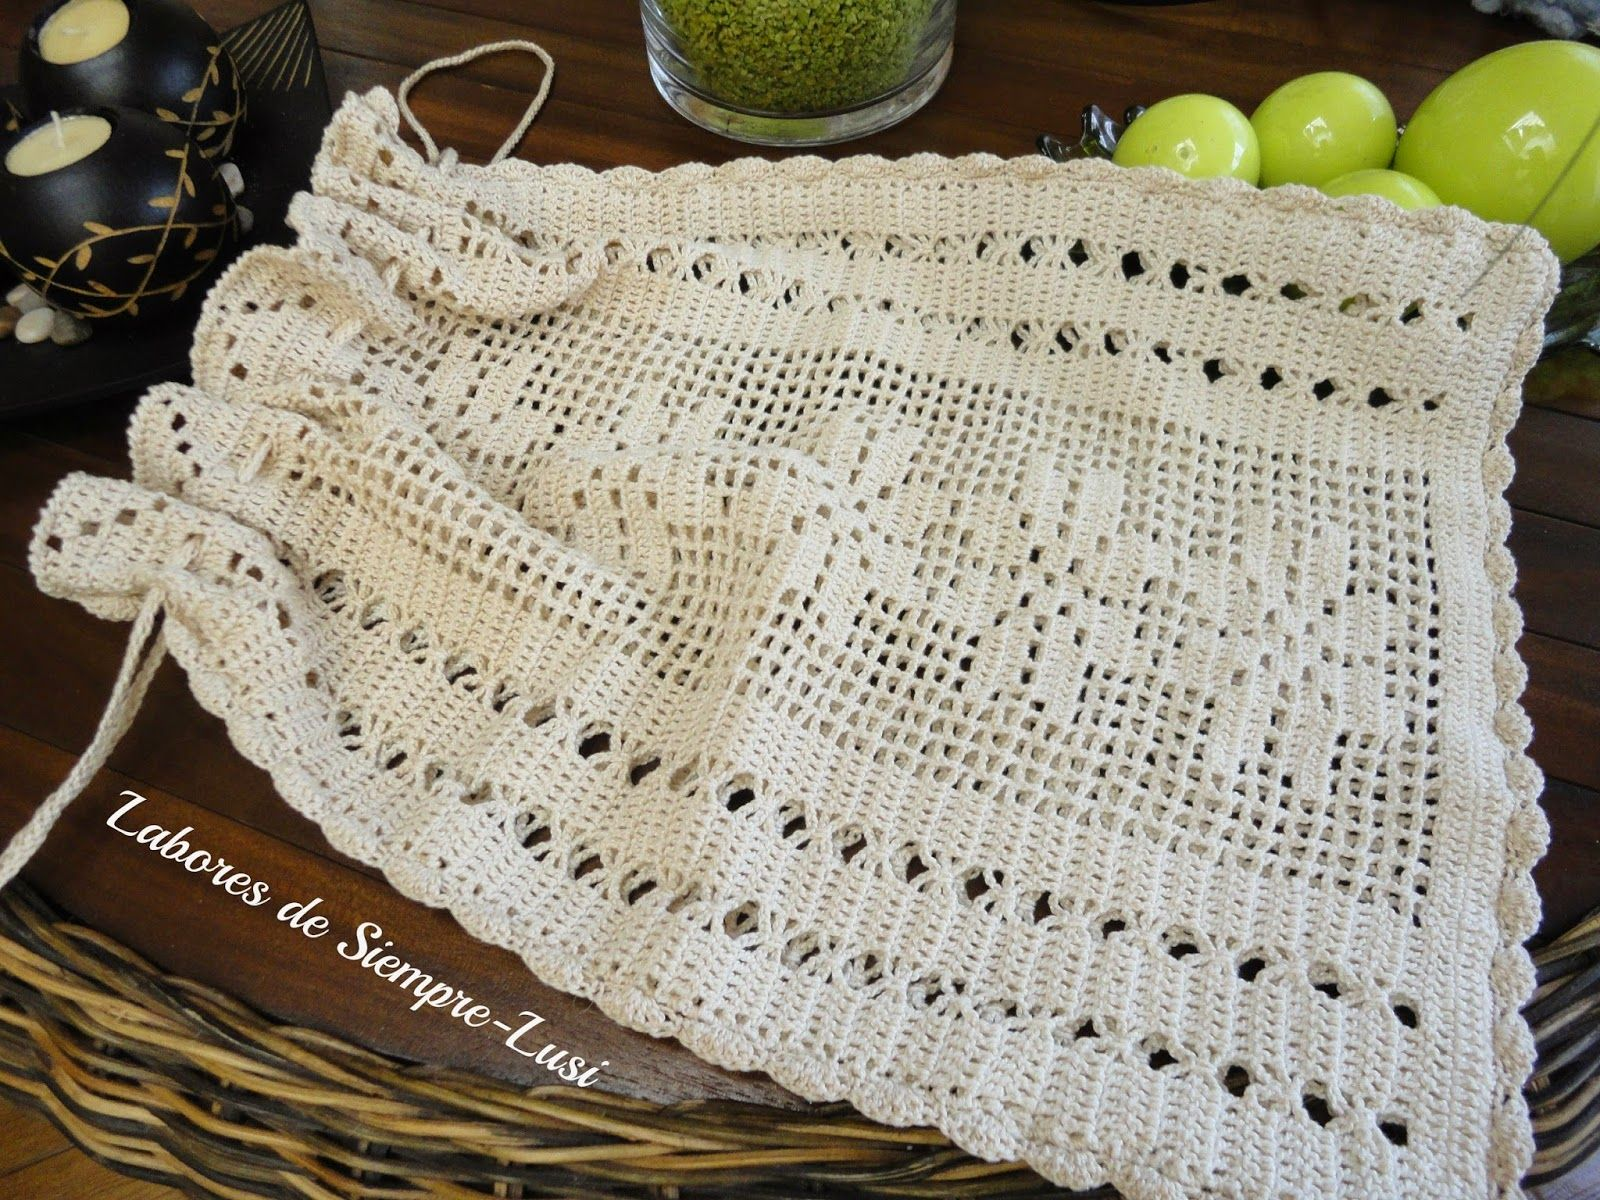 Labores de siempre | Crochet | Pinterest | Croché, Ganchillo y Panes